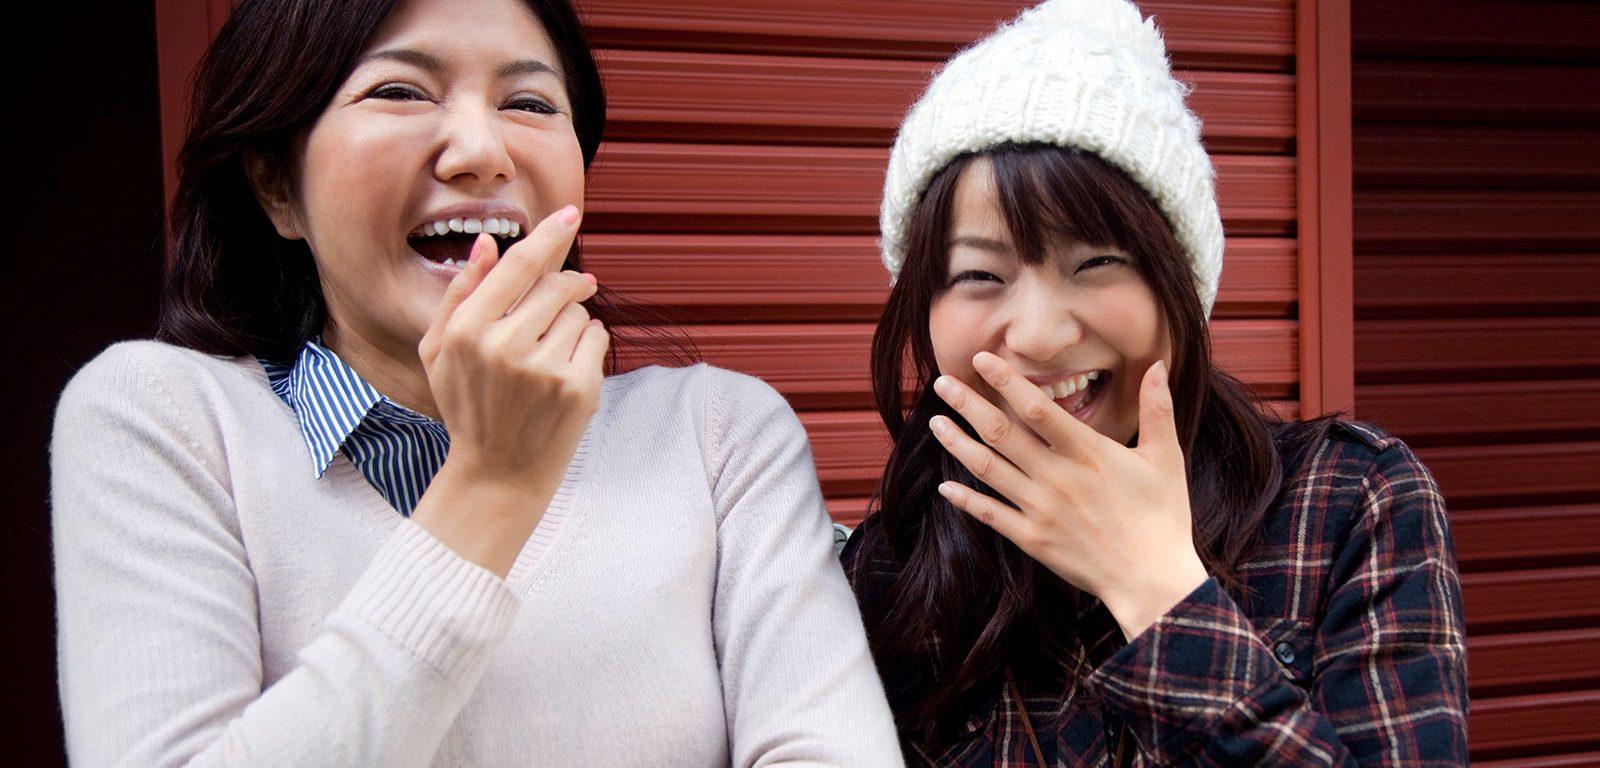 lauging